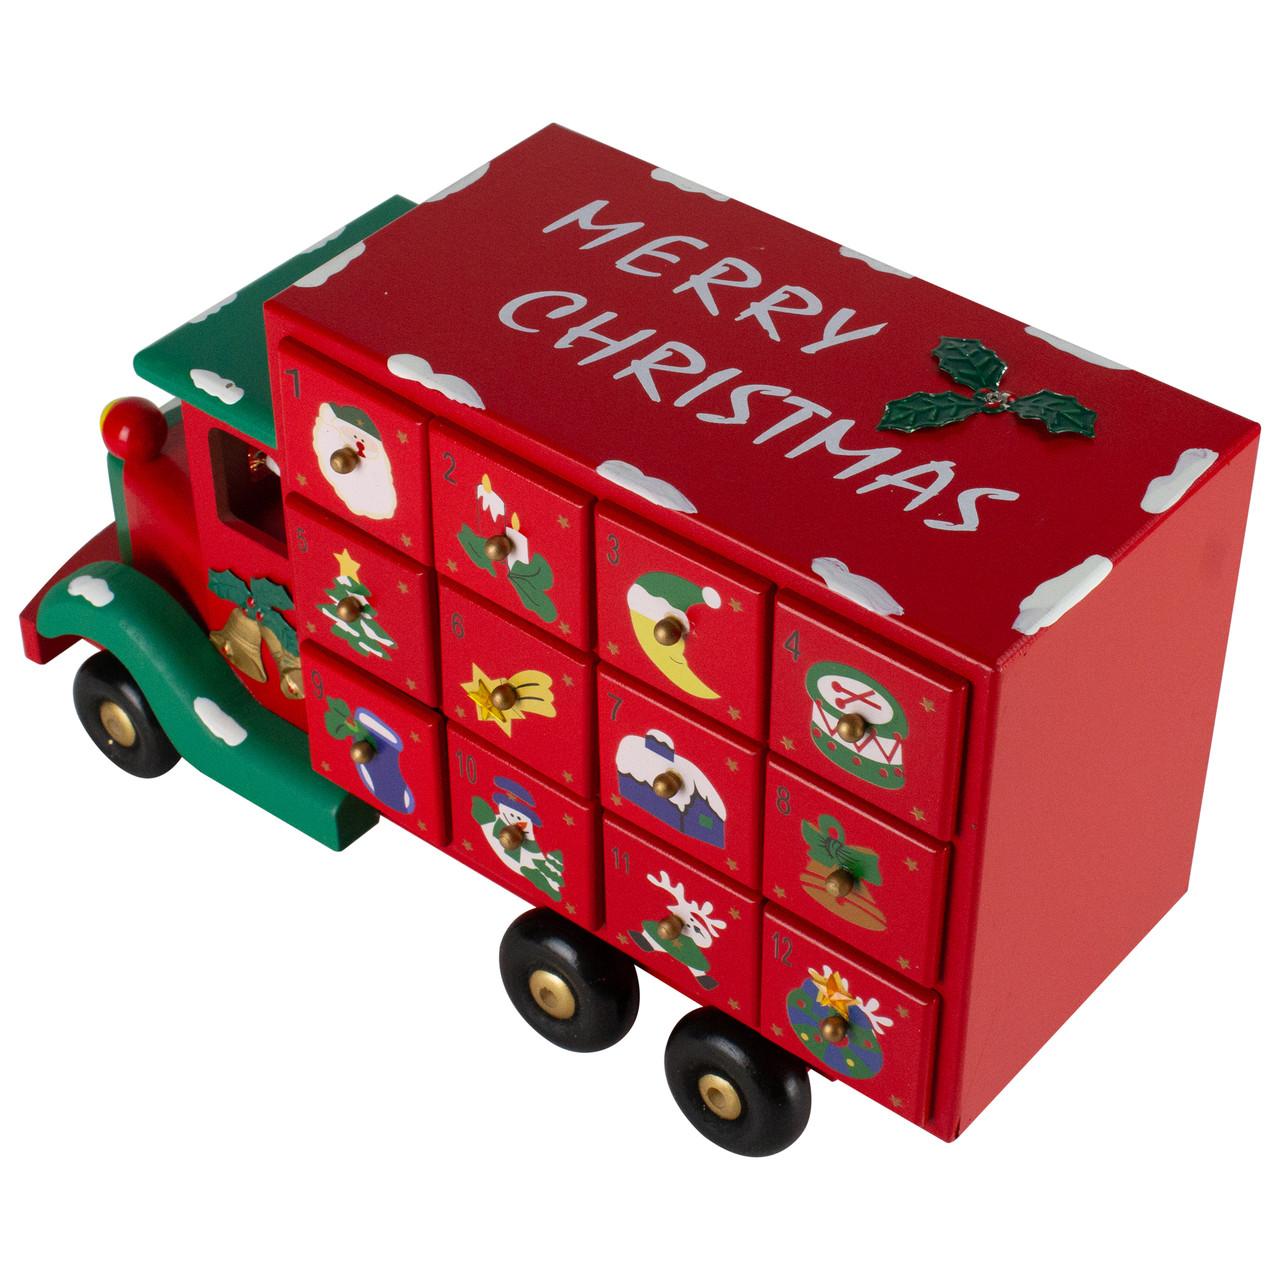 14 childrens advent calendar red storage truck christmas decoration 32634948